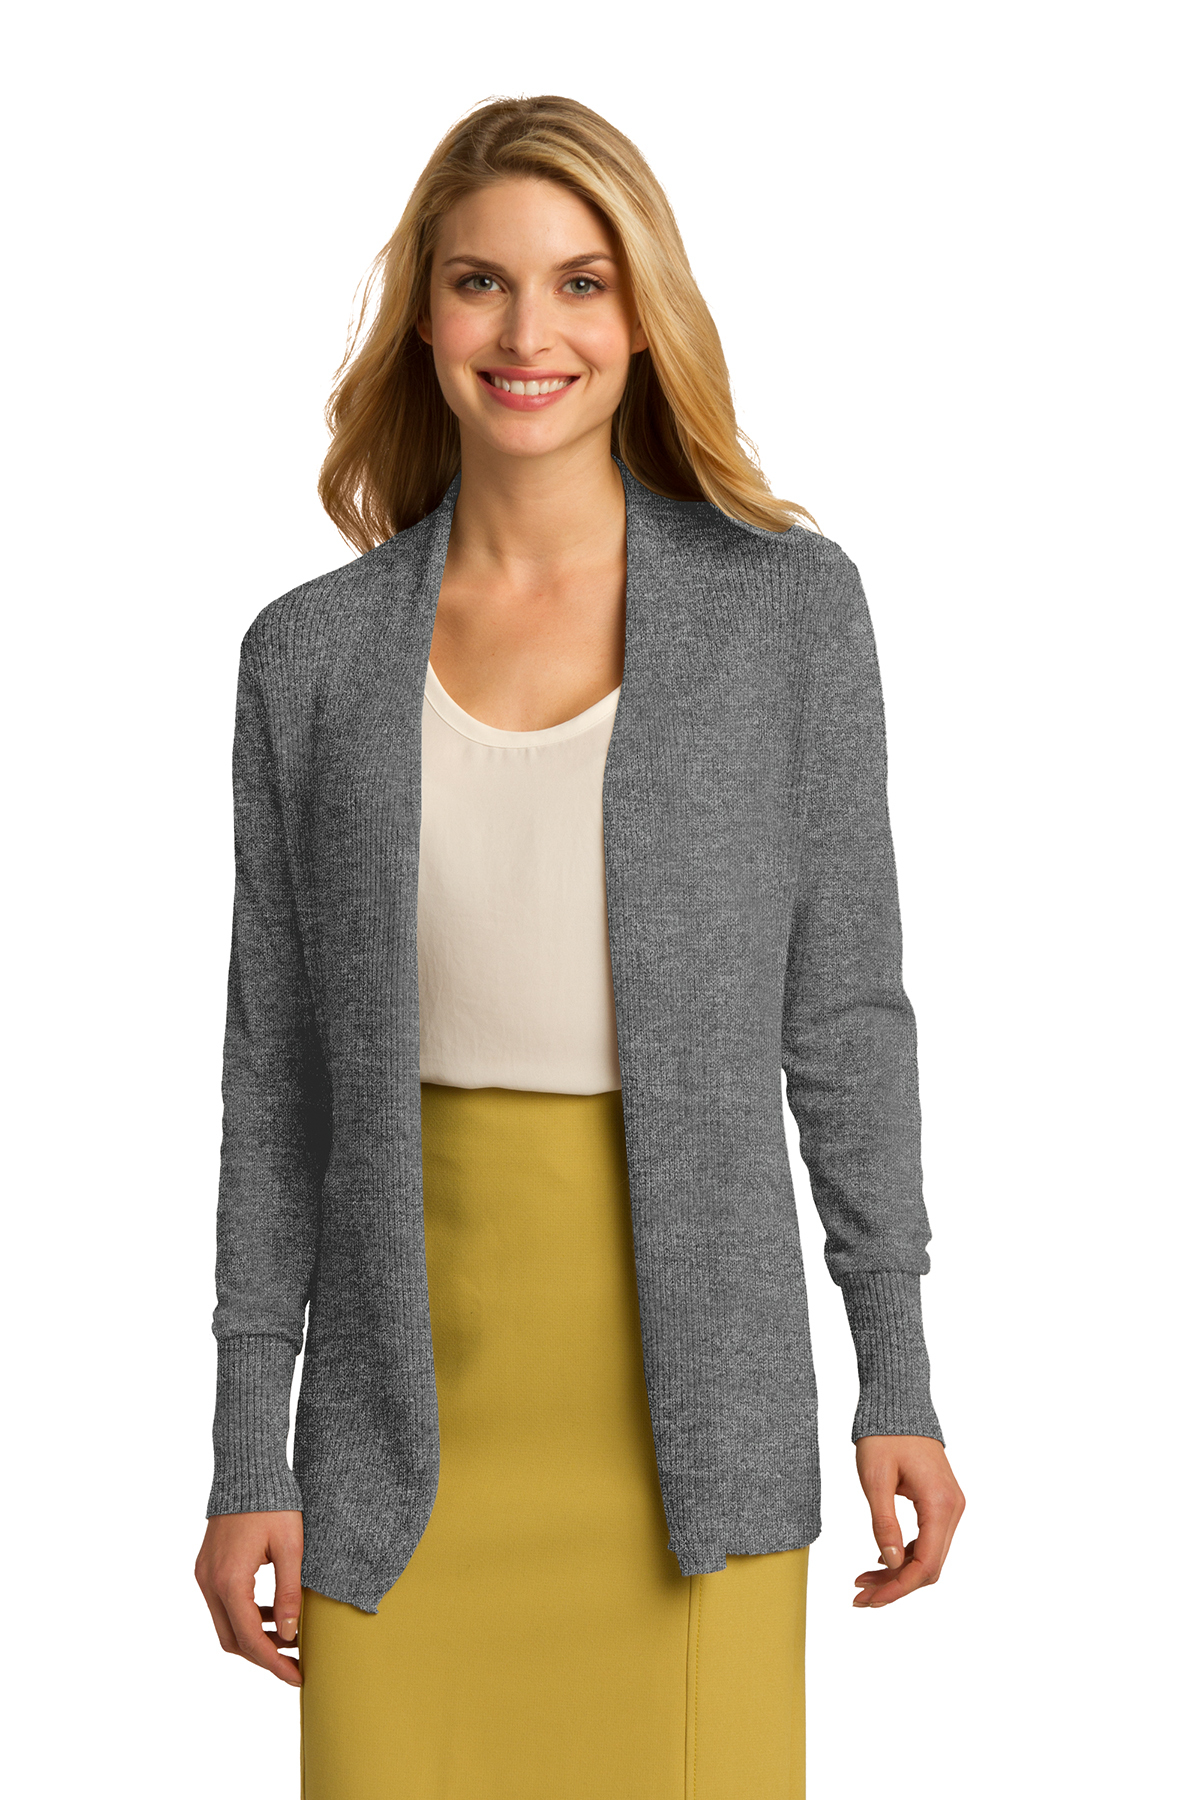 abdf2e844d Port Authority Ladies Value Jewel-Neck Cardigan Sweater. Starting at   33.98. Delete. Port Authority sup   174   sup  Ladies Open Front